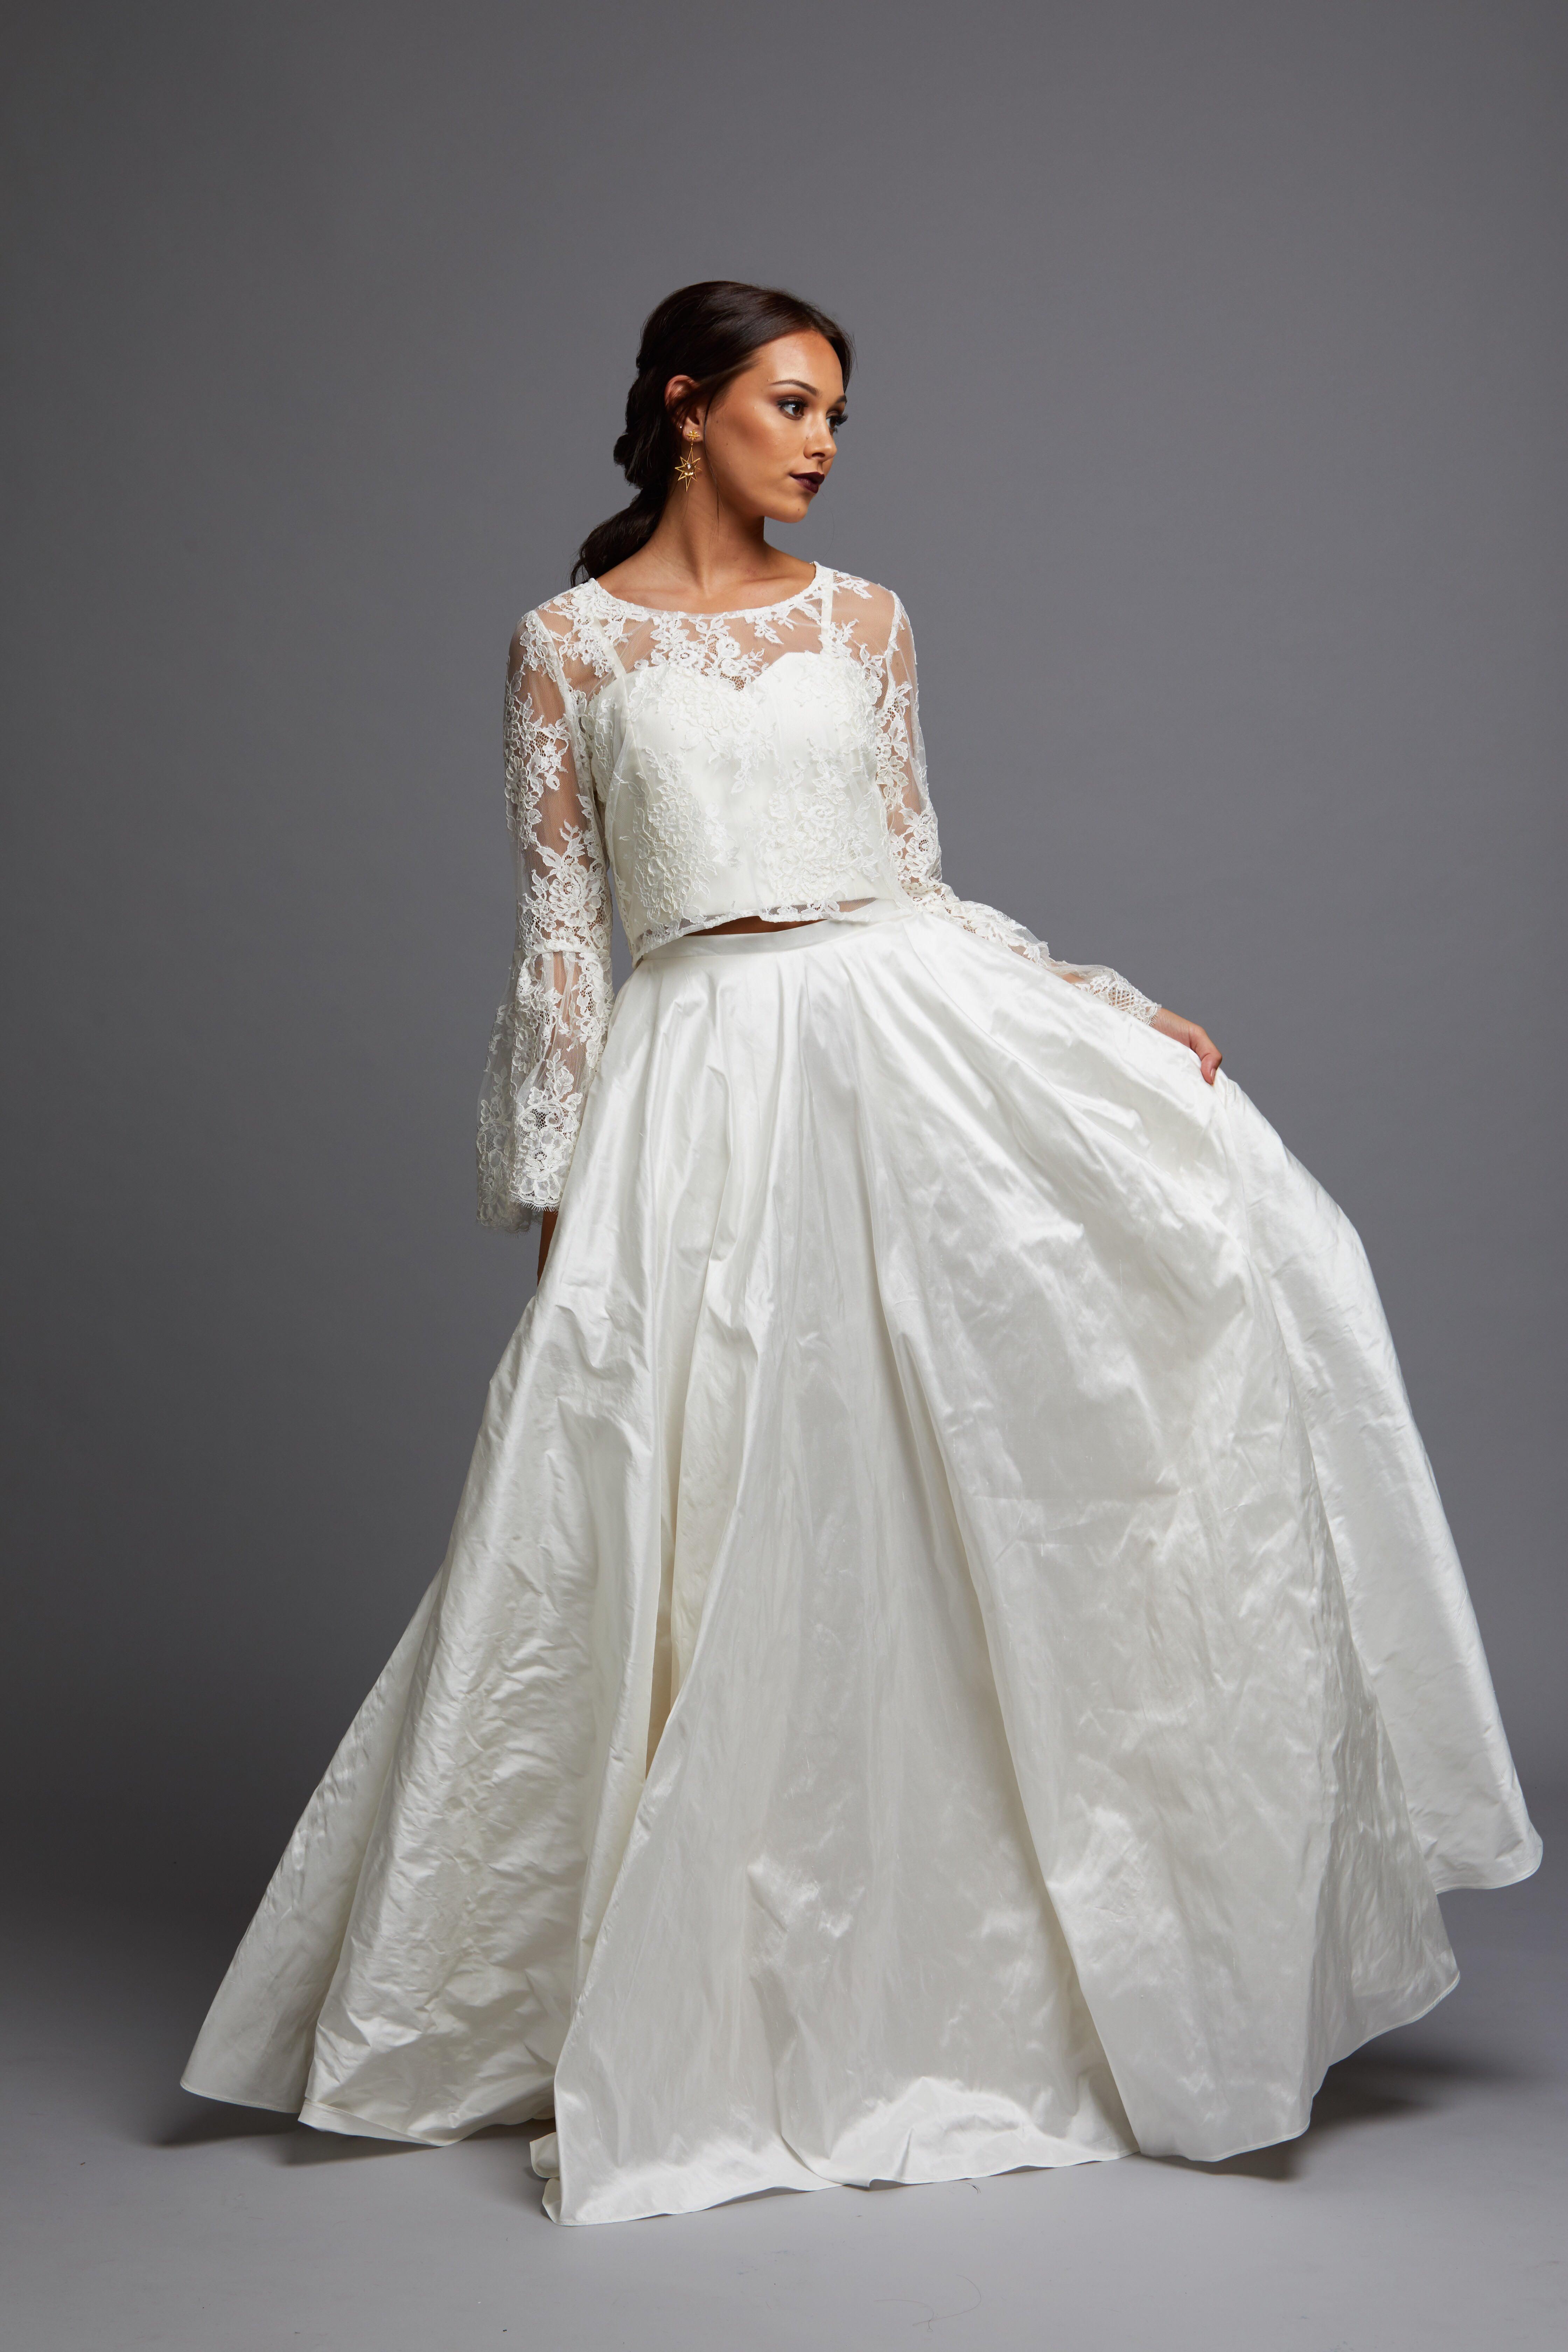 Natalie Chan Bridal Audrey wedding dress bridal shop store gowns christchurch wellington